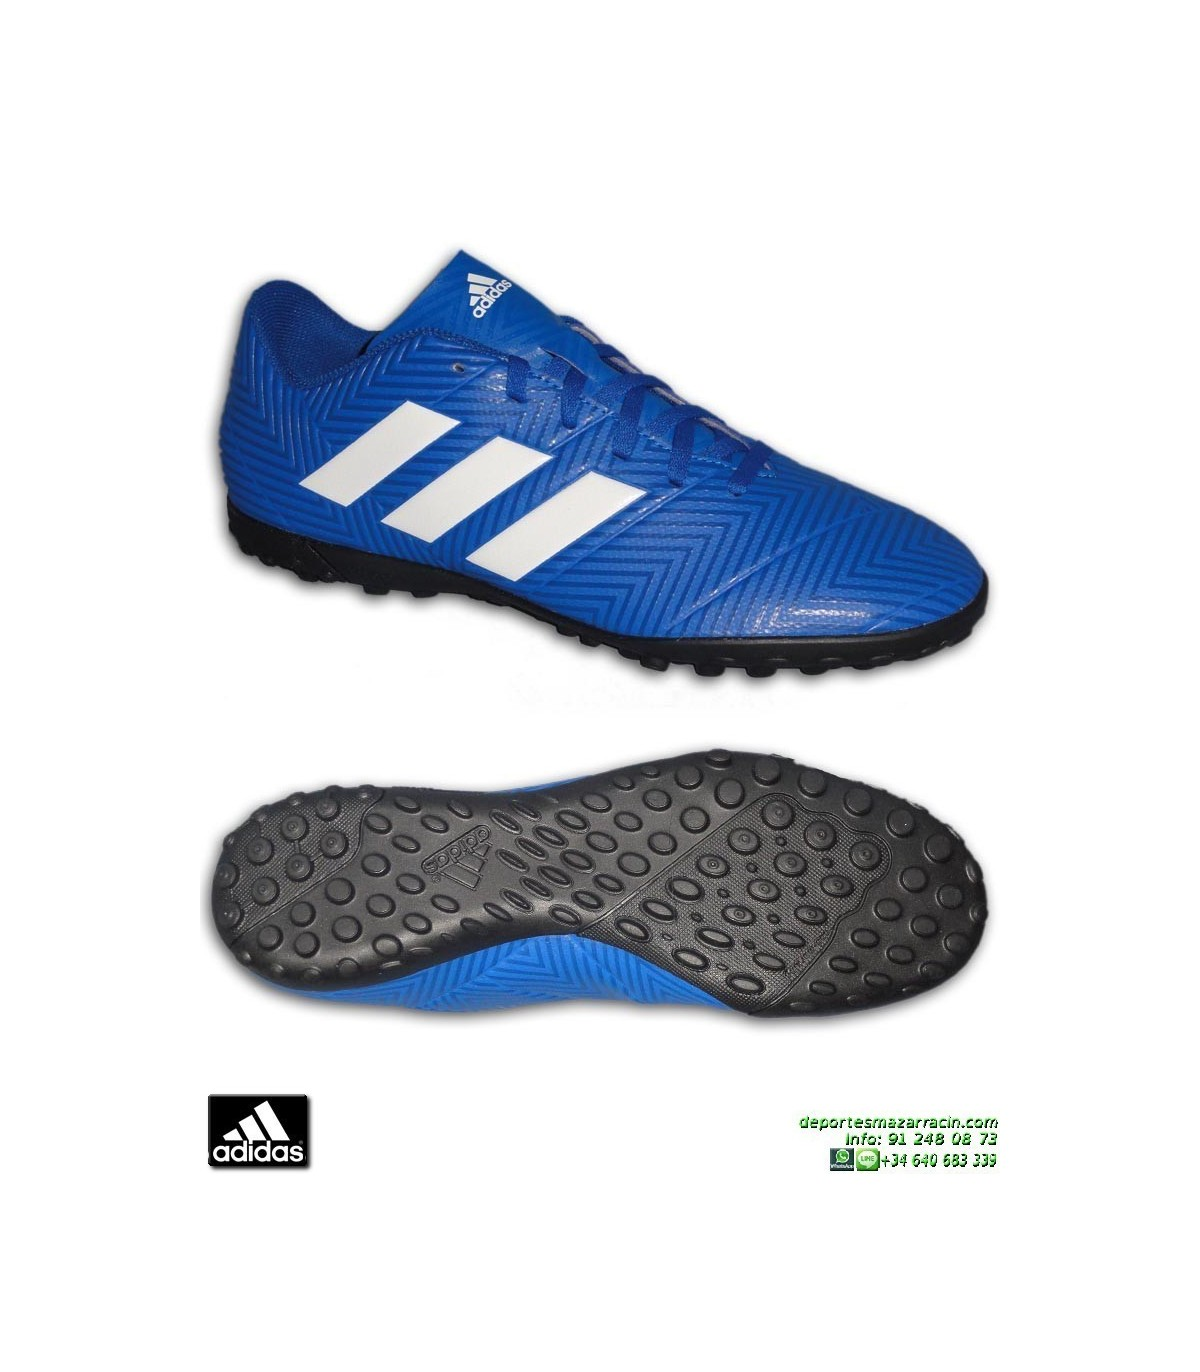 ba1b678d48c ADIDAS NEMEZIZ TANGO 18.4 Azul Zapatilla Futbol Turf Hierba Artificial  DB2264 hombre adulto personalizar · ADIDAS NEMEZIZ ...